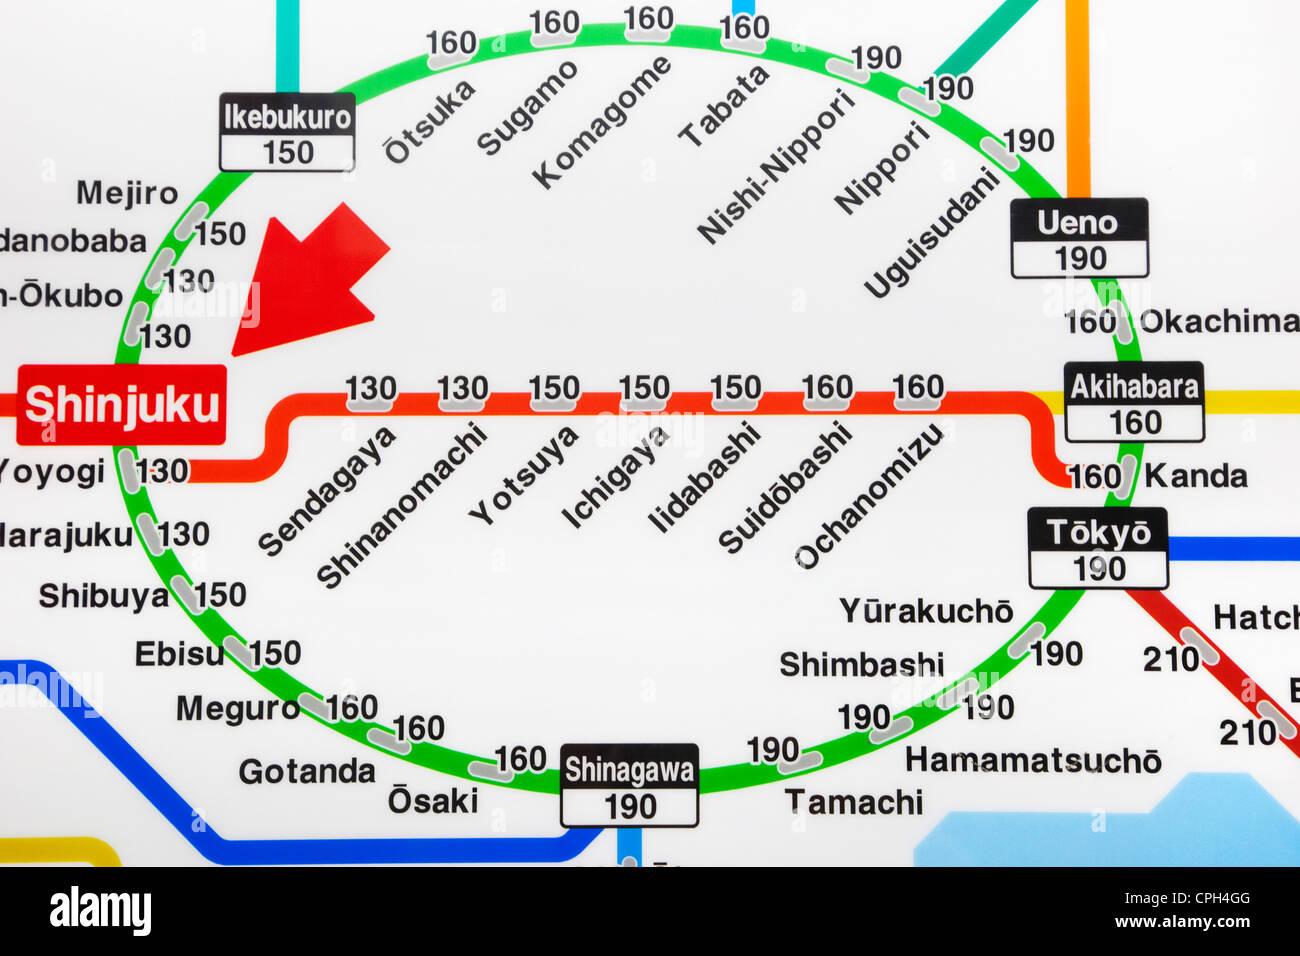 Asia Japan Tokyo Train Map Tokyo Railway Map JR Japan - Japan map tokyo